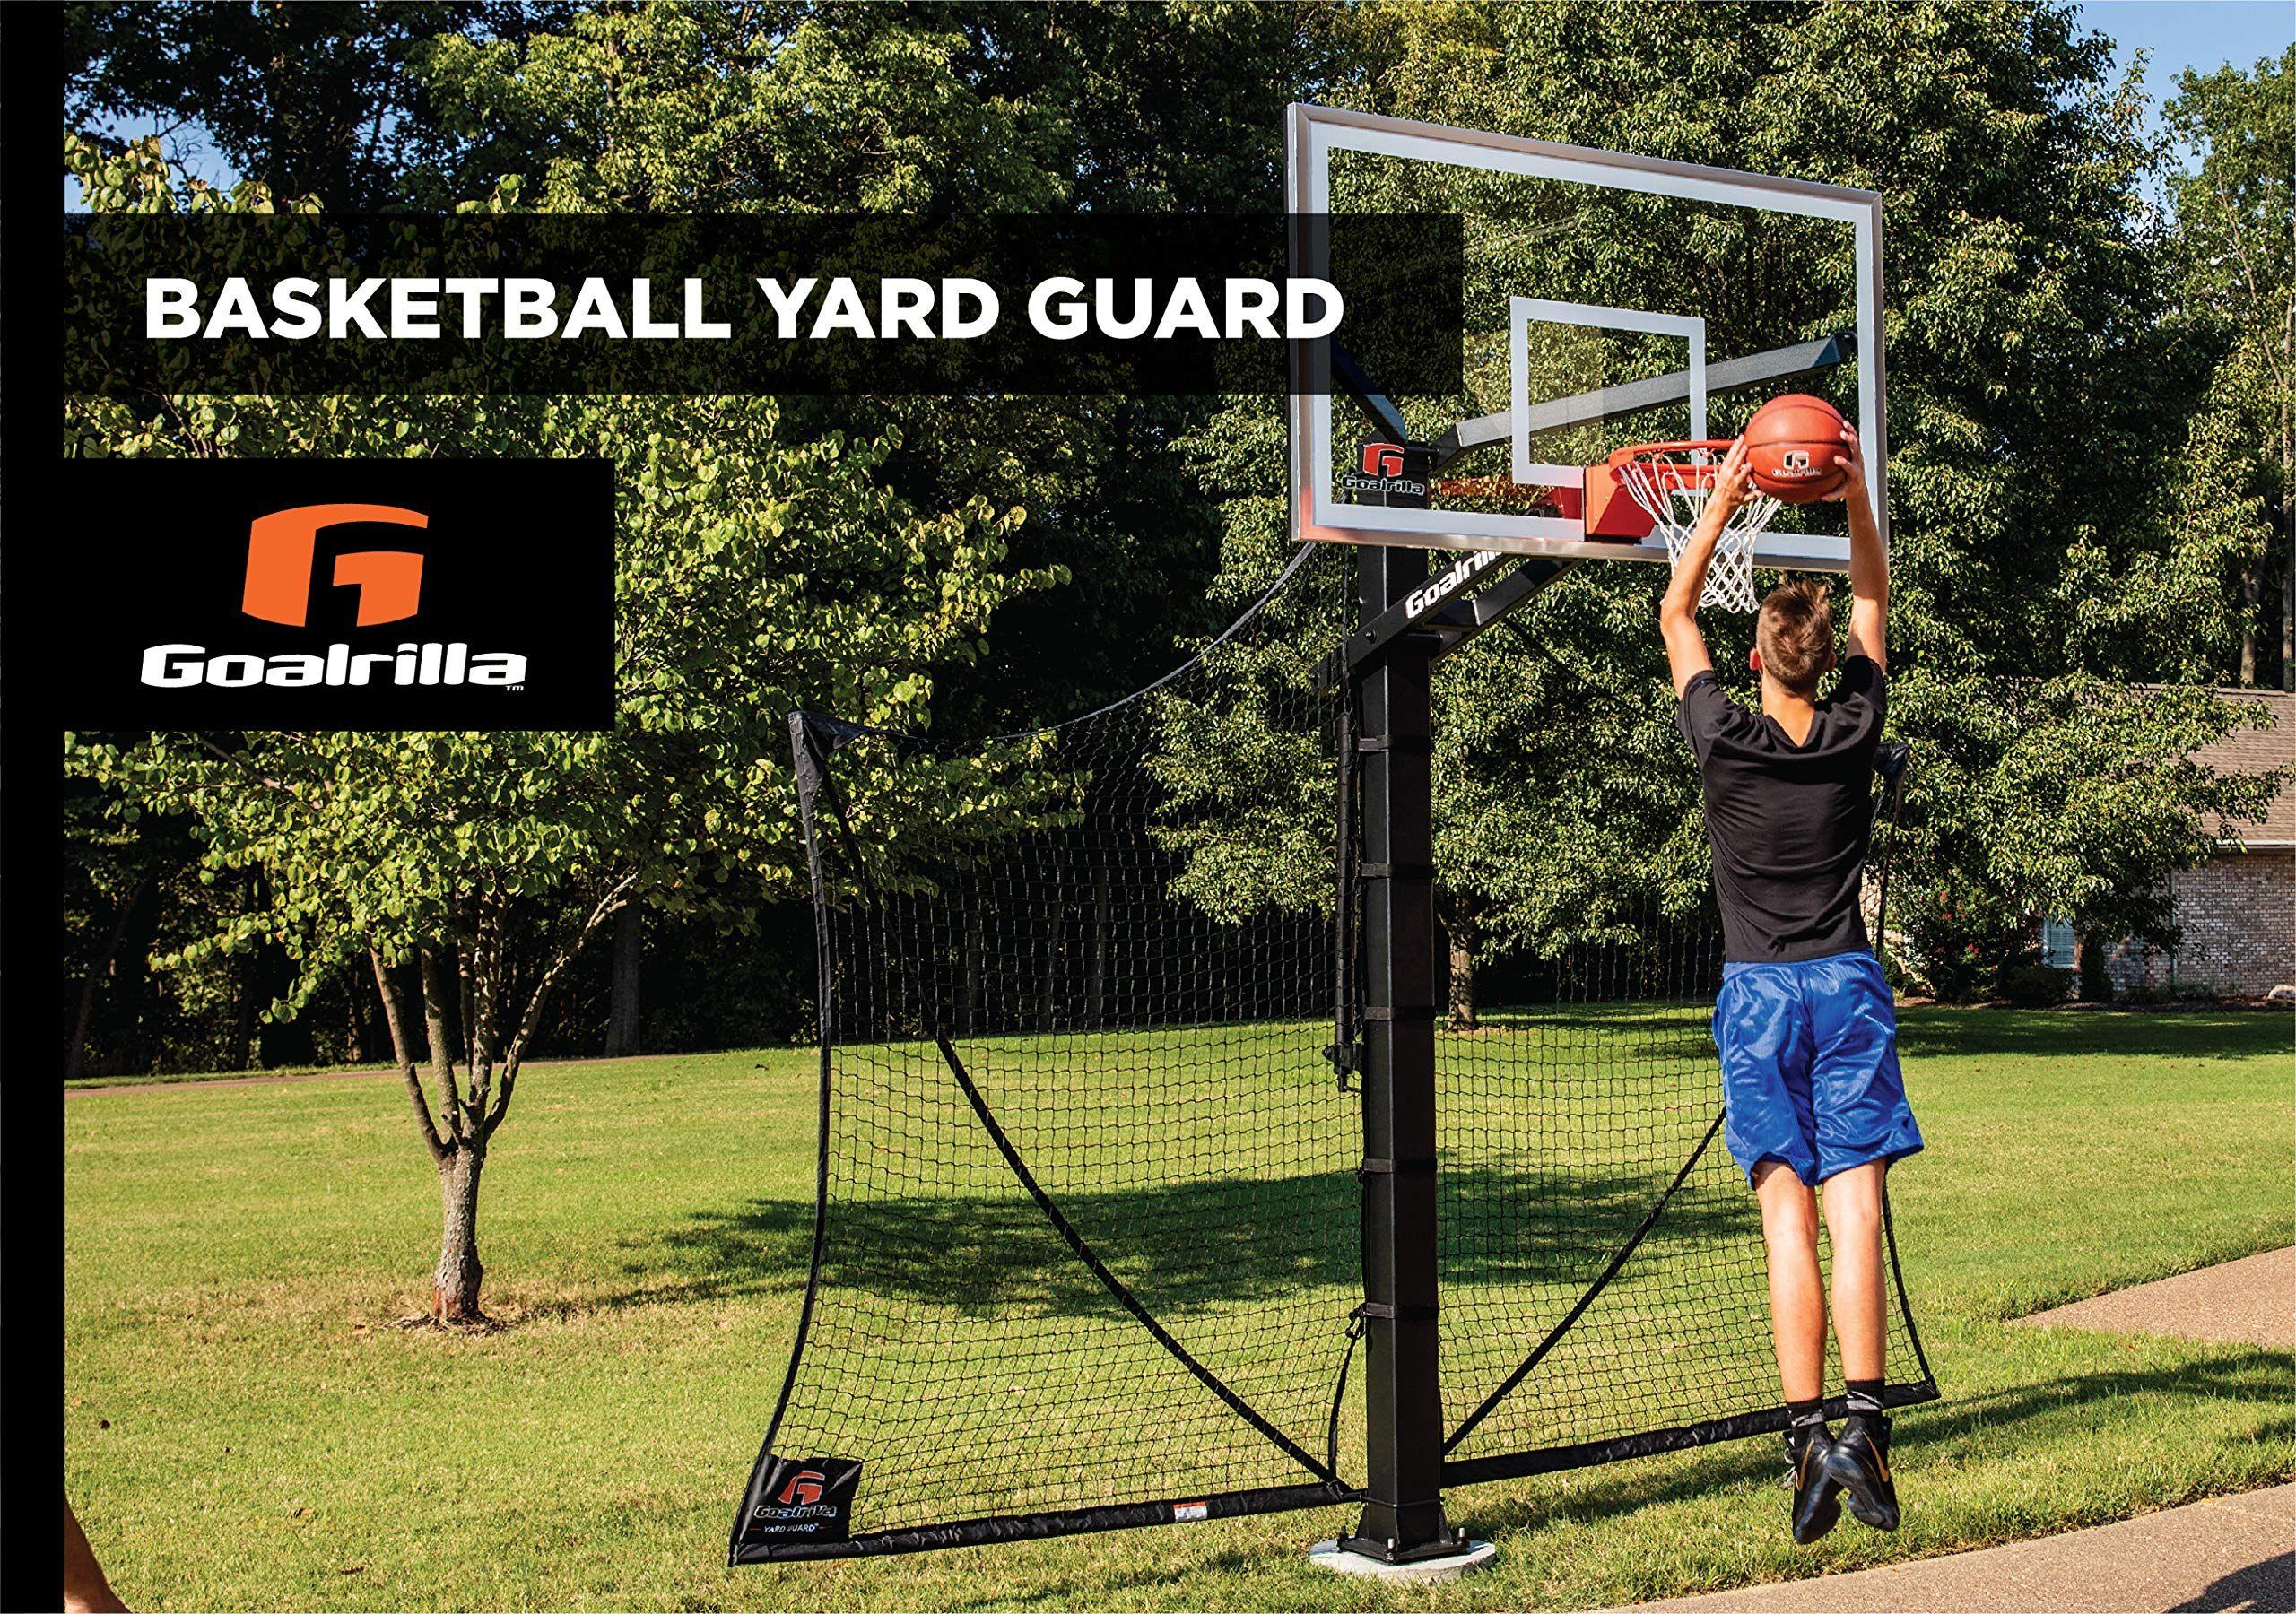 Amazon Com Goalrilla Basketball Yard Guard Easy Fold Defensive Net System Quickly Installs On Any Basketball Hoop 3 Pack In 2020 Basketball Basketball Hoop Guard